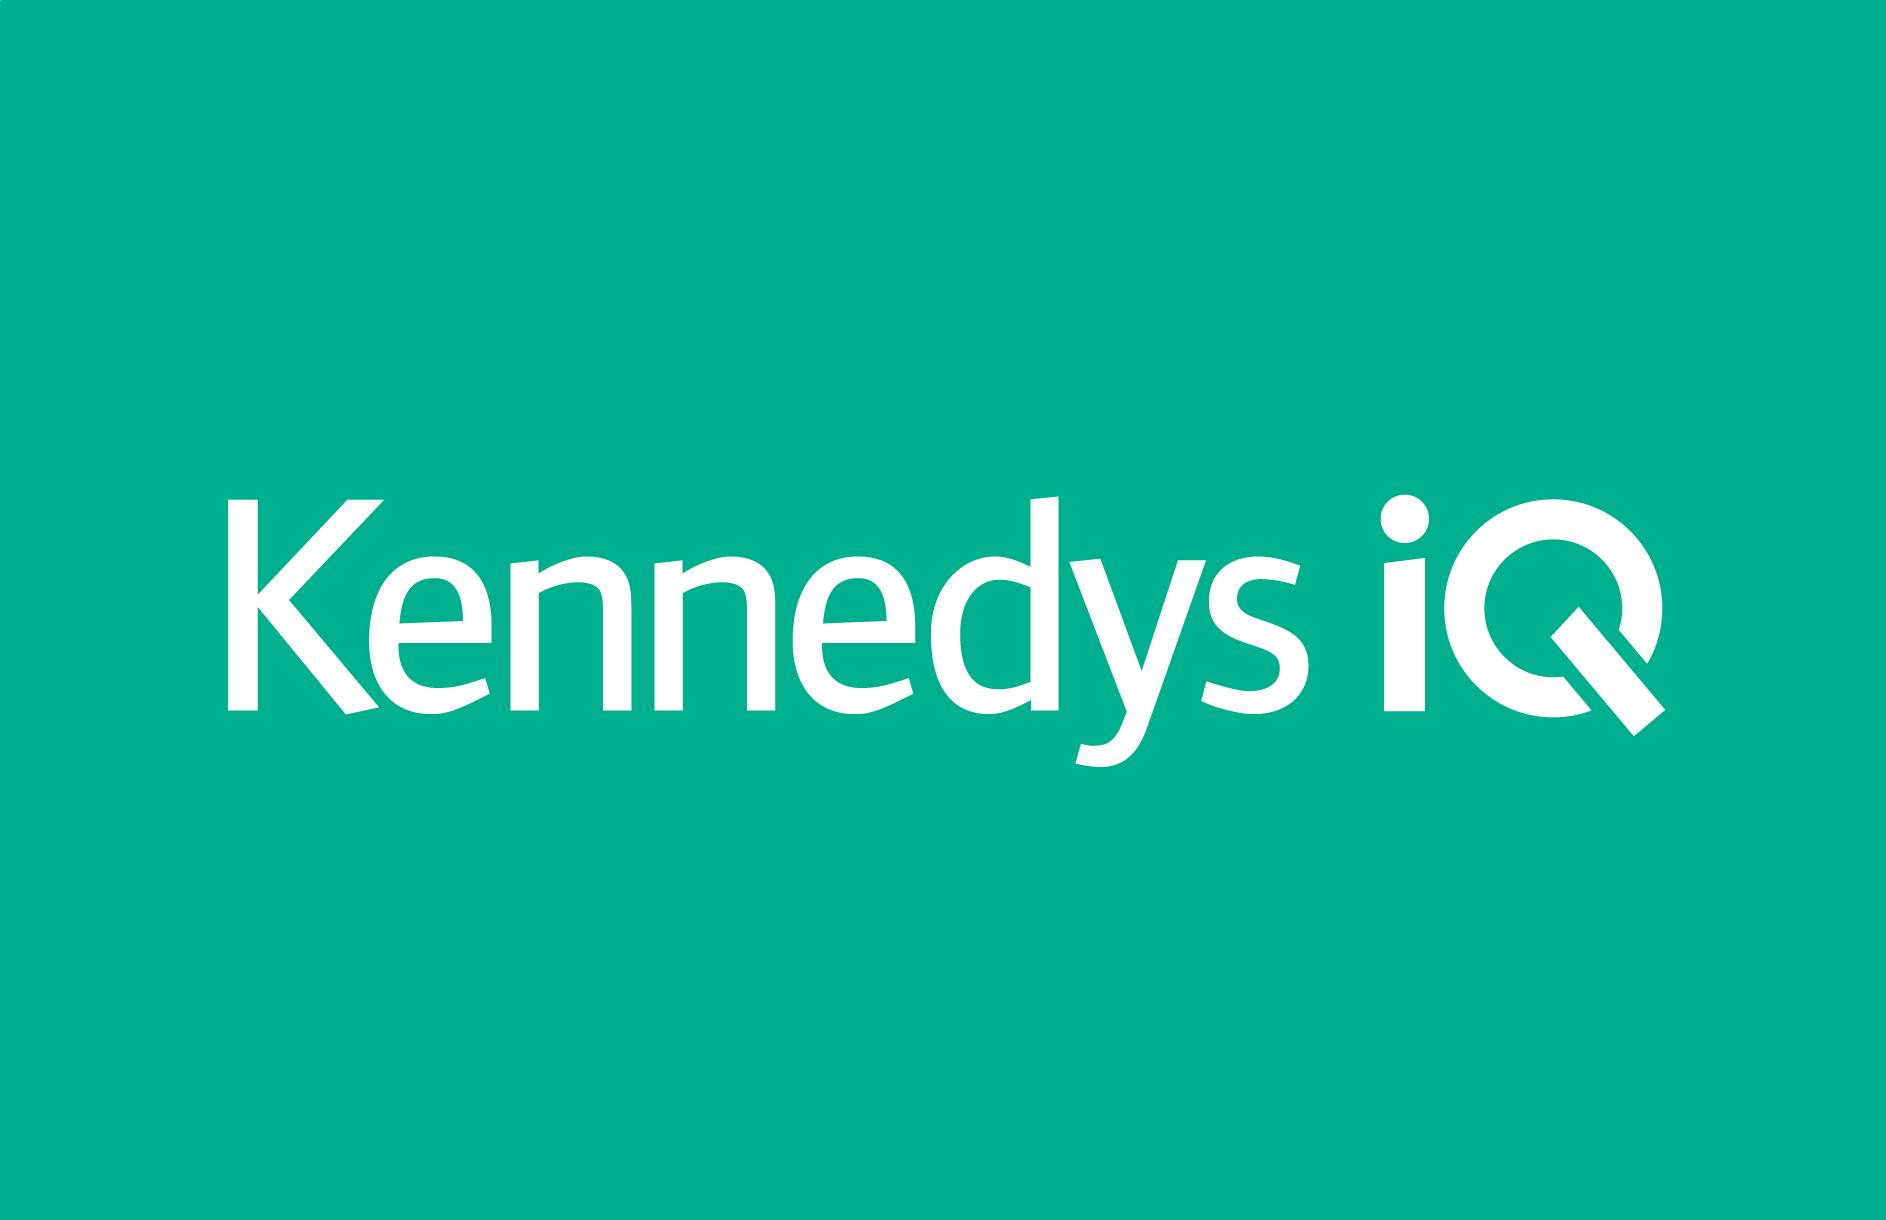 Kennedys / Kennedys IQ Brand identity